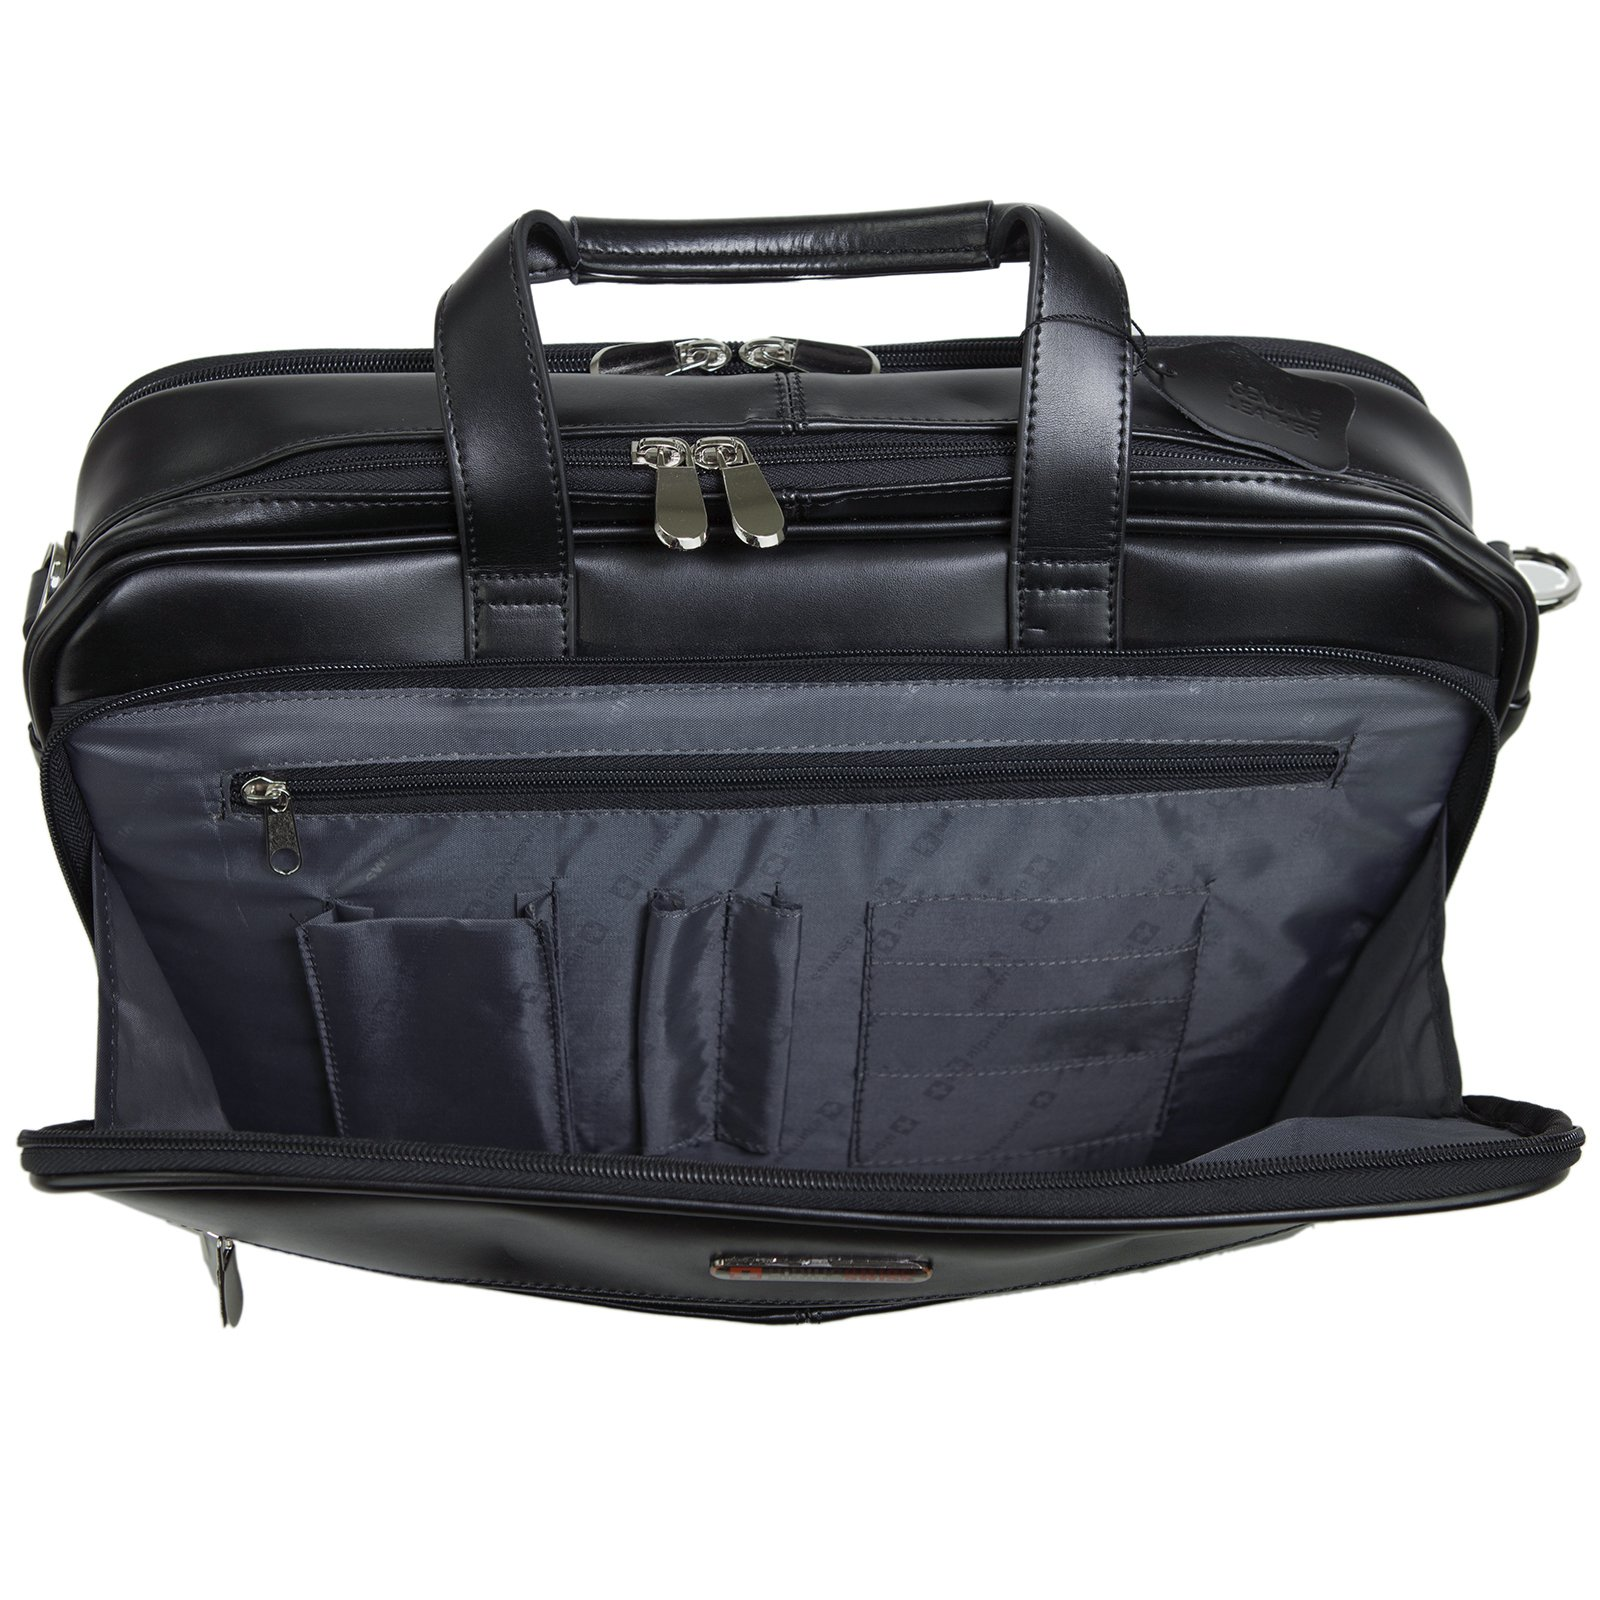 Alpine Swiss Monroe Leather Briefcase Top-Zip Laptop Messenger Bag Black by alpine swiss (Image #6)